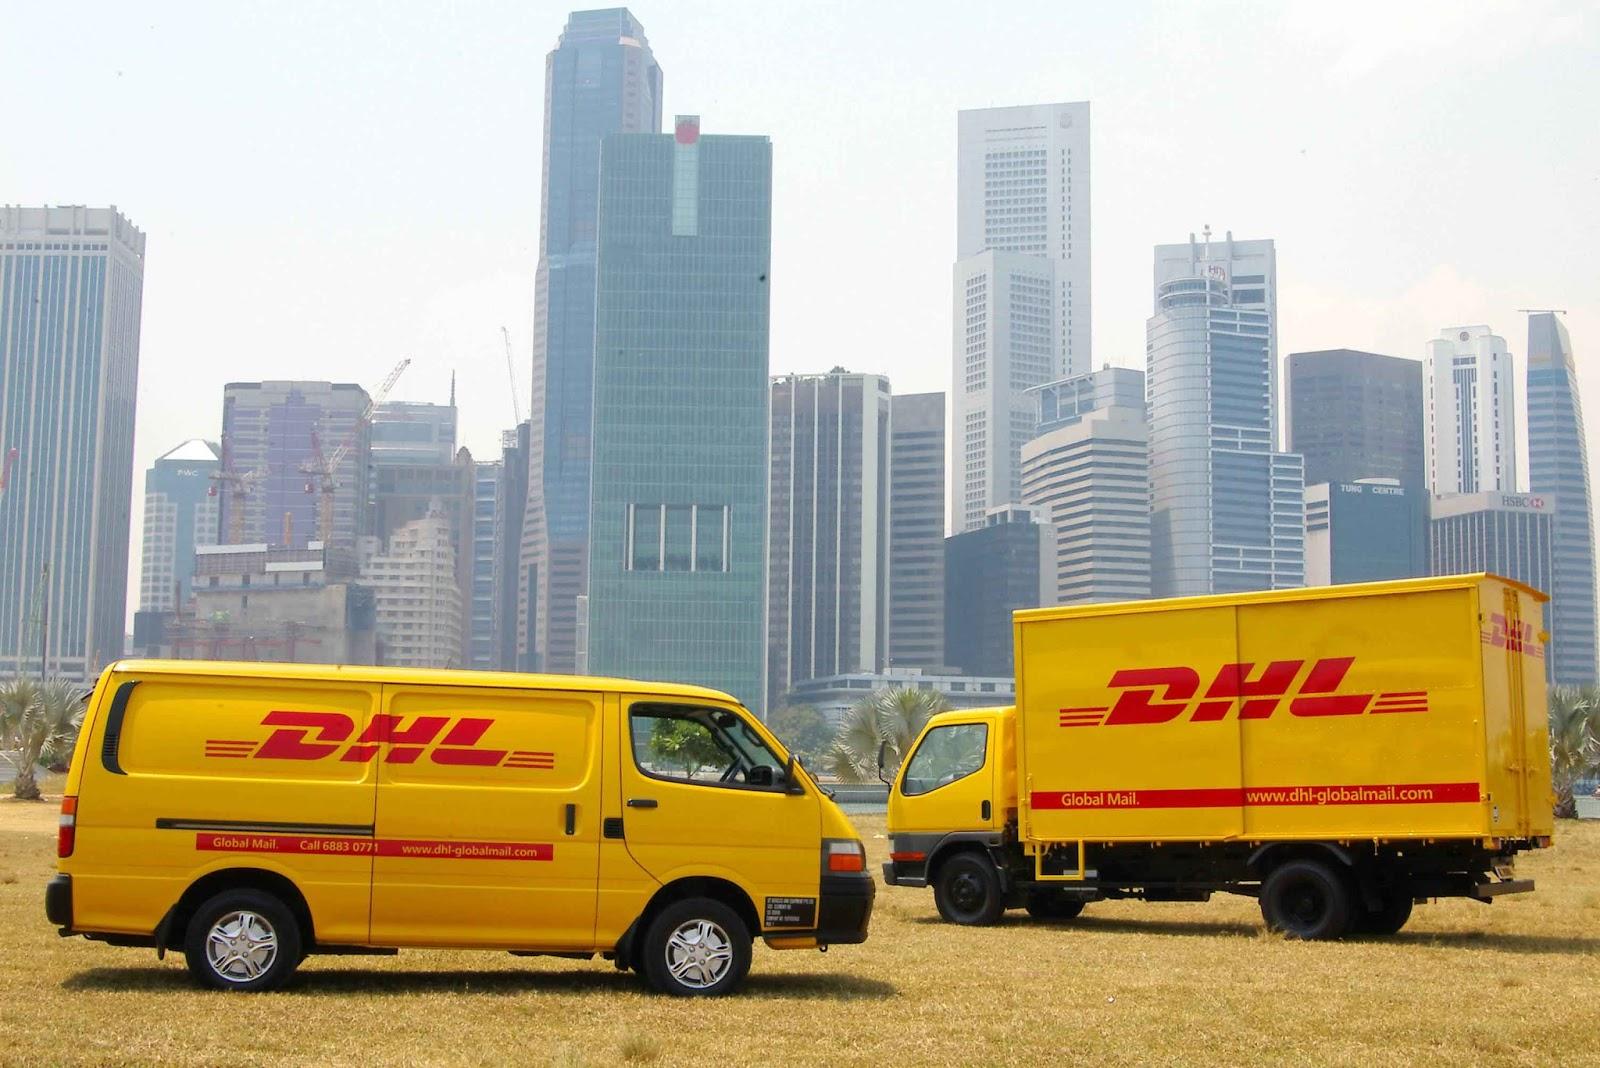 berlin deutsche post invests in network as parcel deliveries drive profits. Black Bedroom Furniture Sets. Home Design Ideas